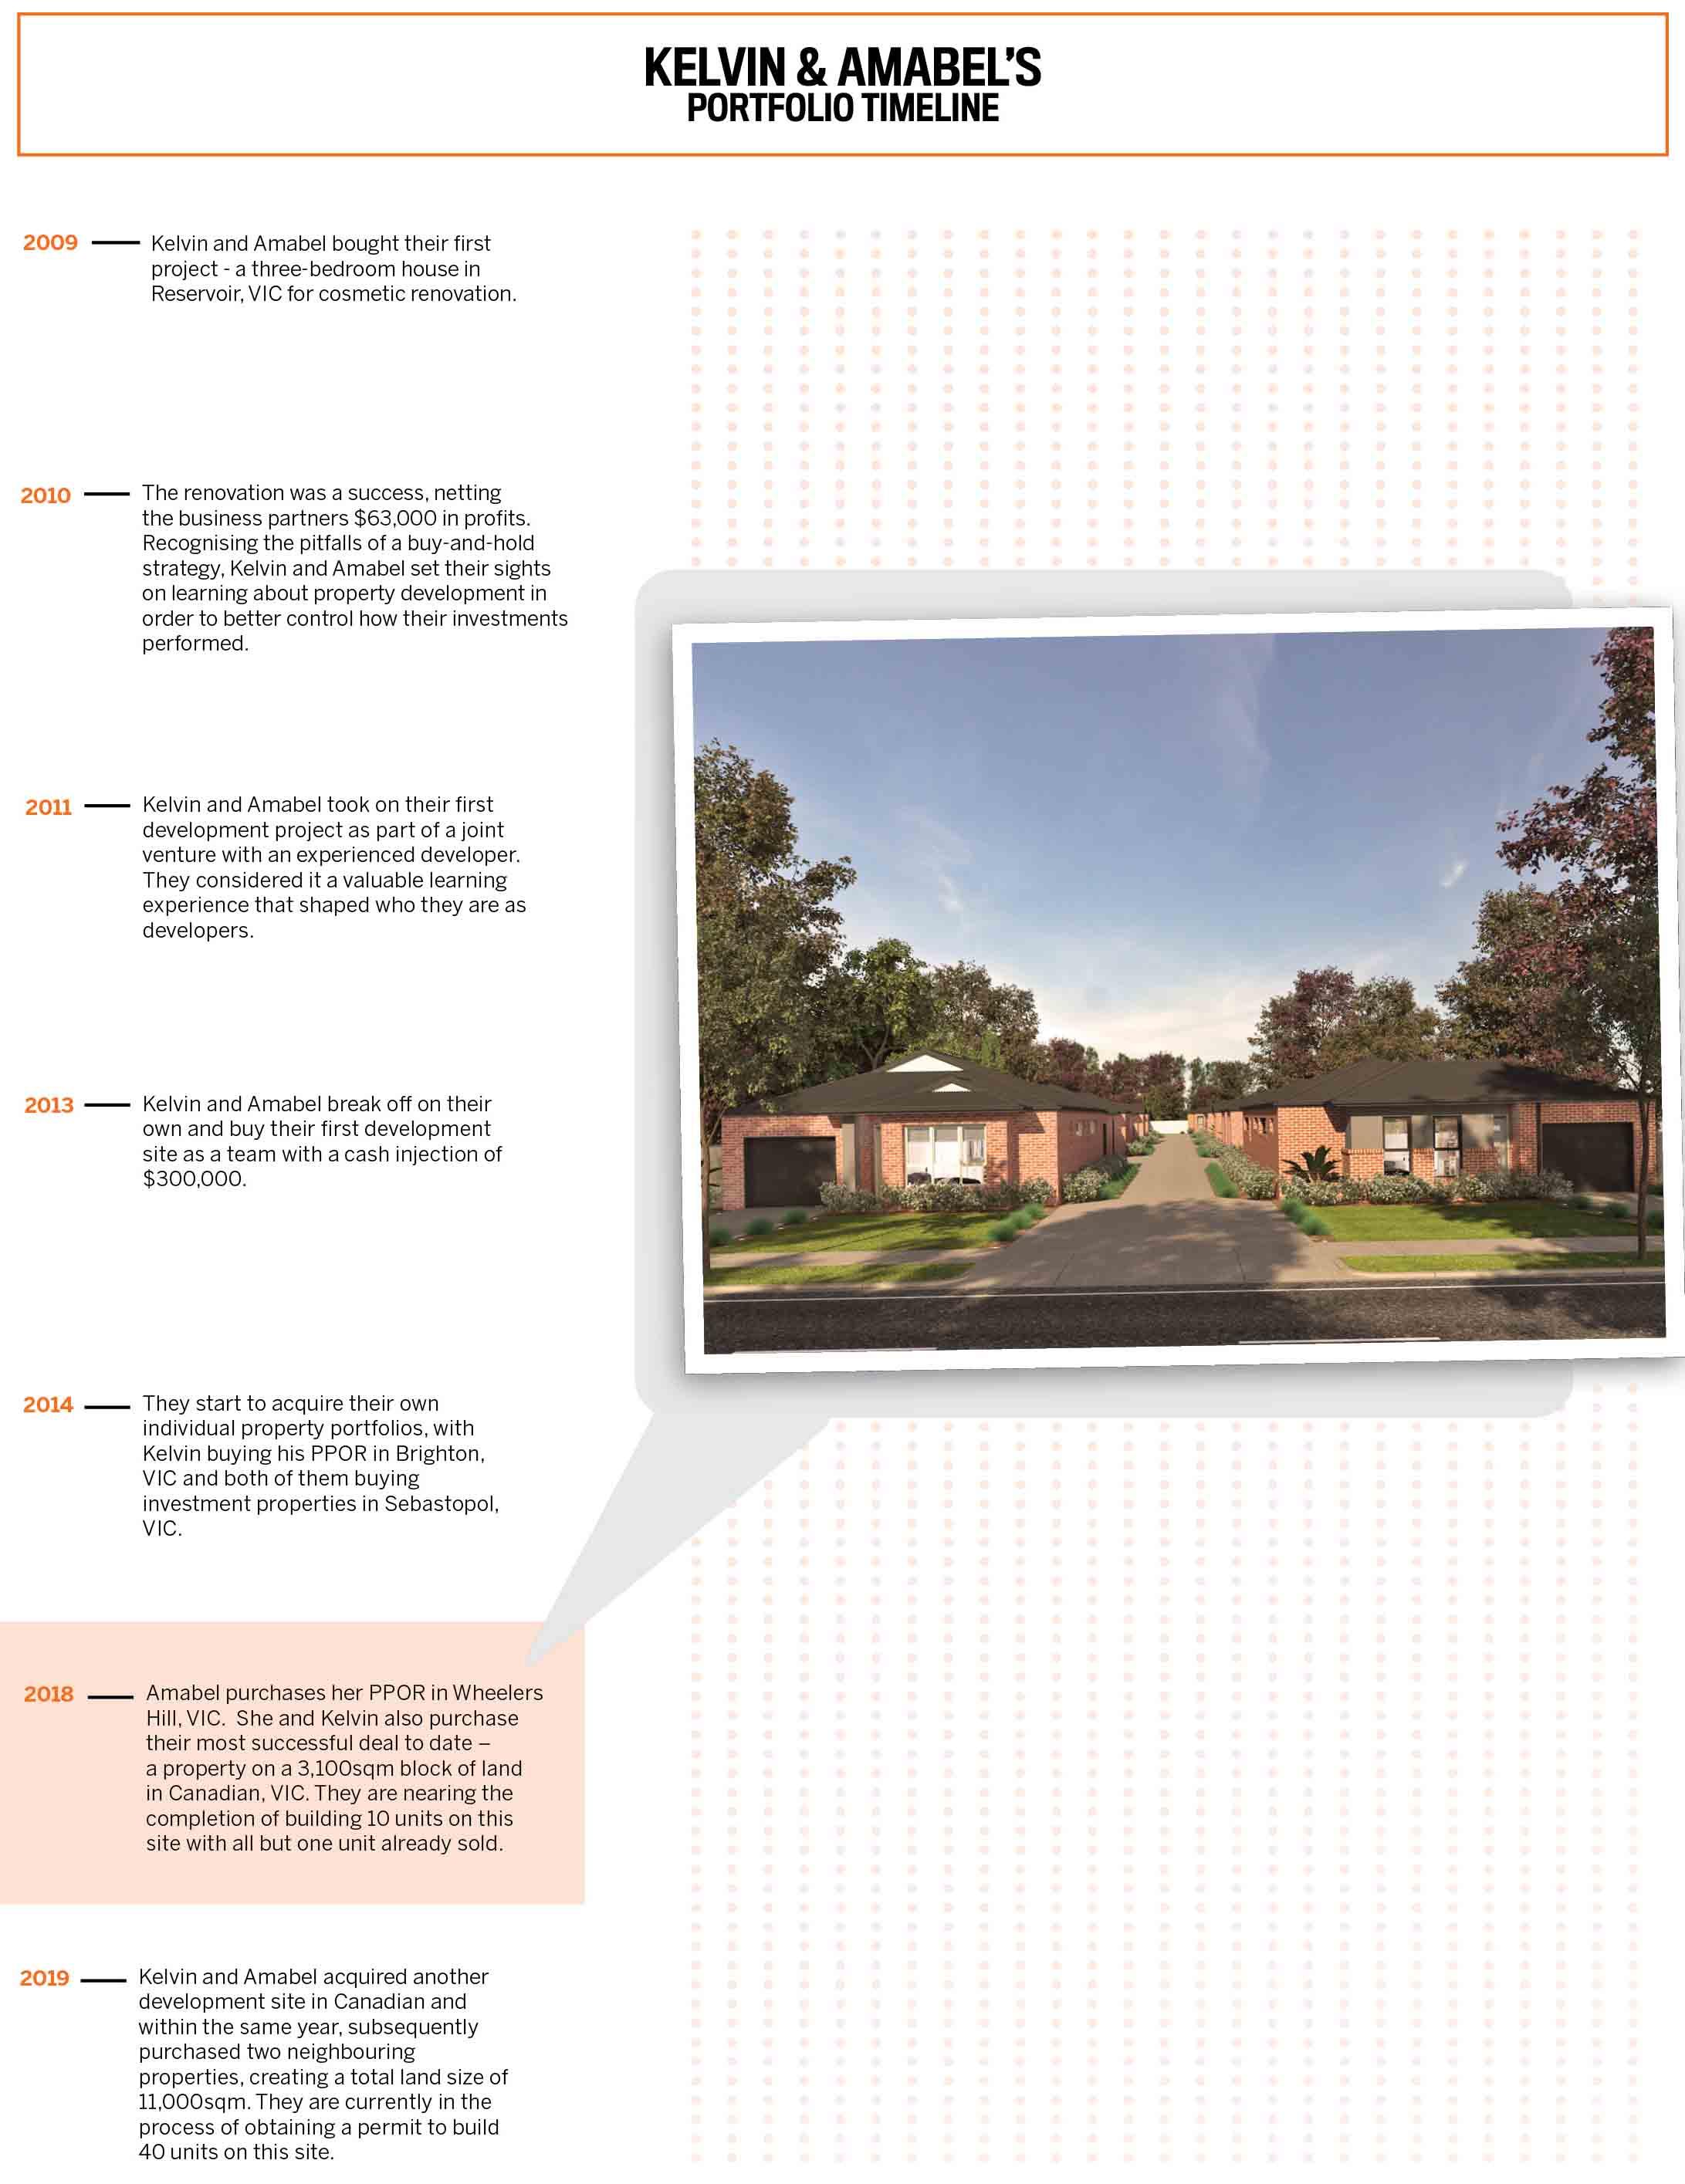 Kelvin & Amabel's Portfolio Timeline